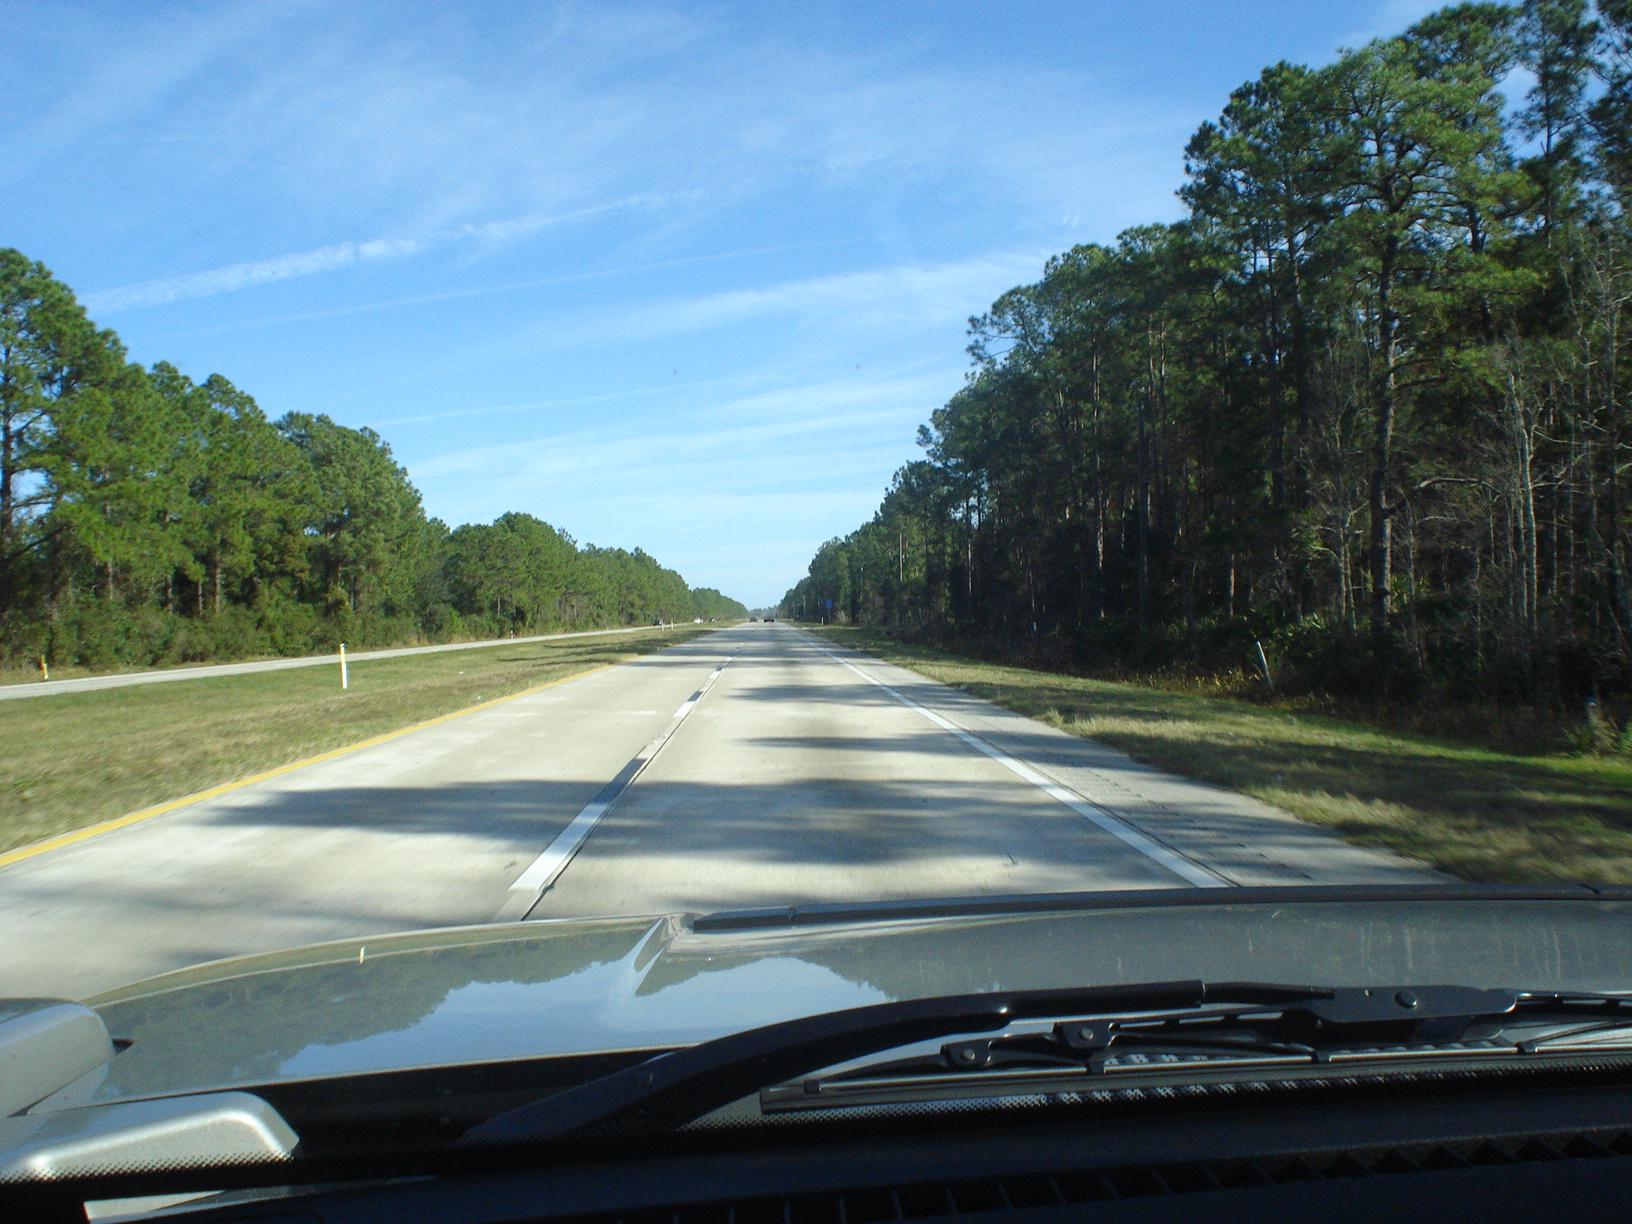 Deland Fl 1 25 Acres Land Daytona Beach Florida Lot